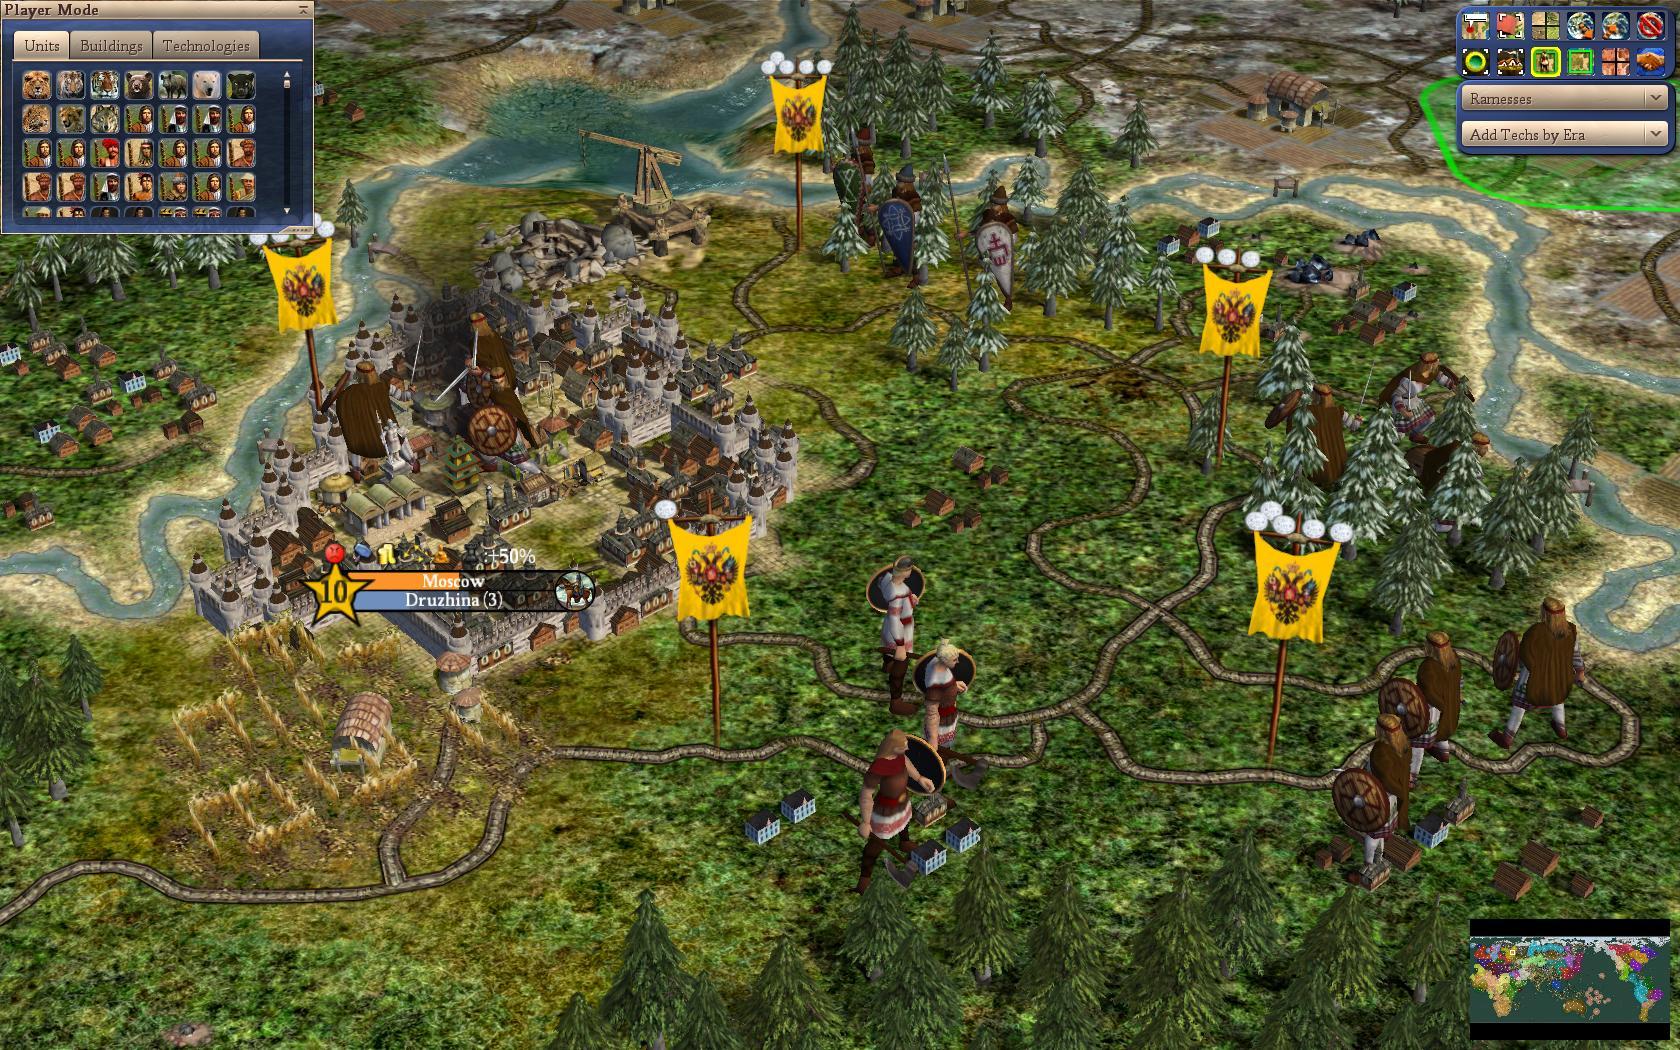 World Map Scenario Screenshot Moscow Image Realism Invictus Mod